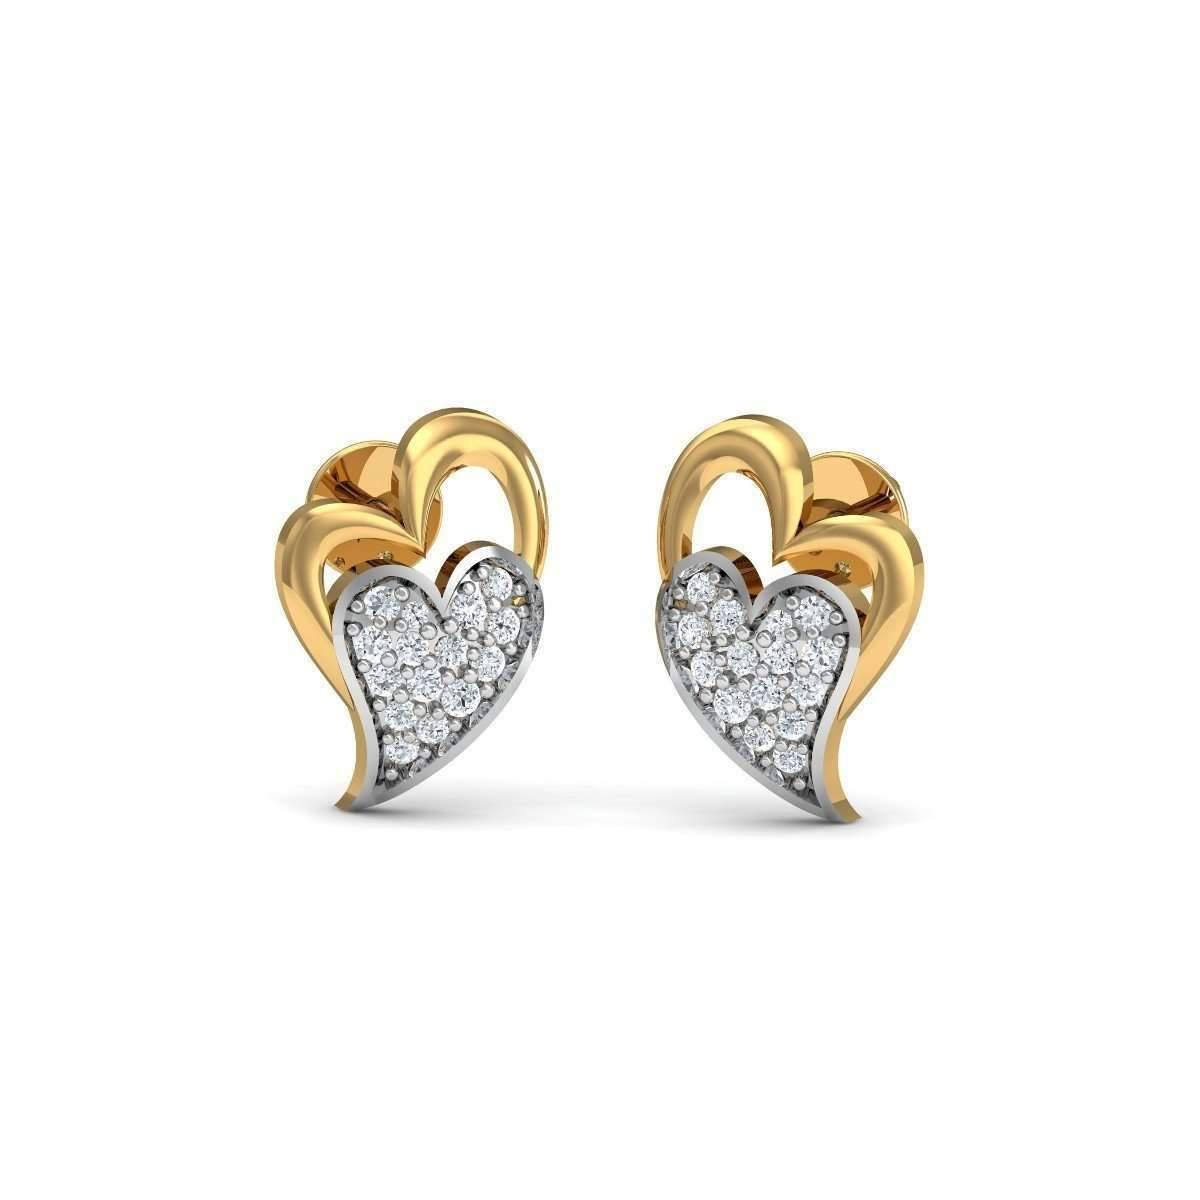 Diamoire Jewels Aileron Diamond Stud Earrings in 18kt Rose Gold hTgDQ4buXg